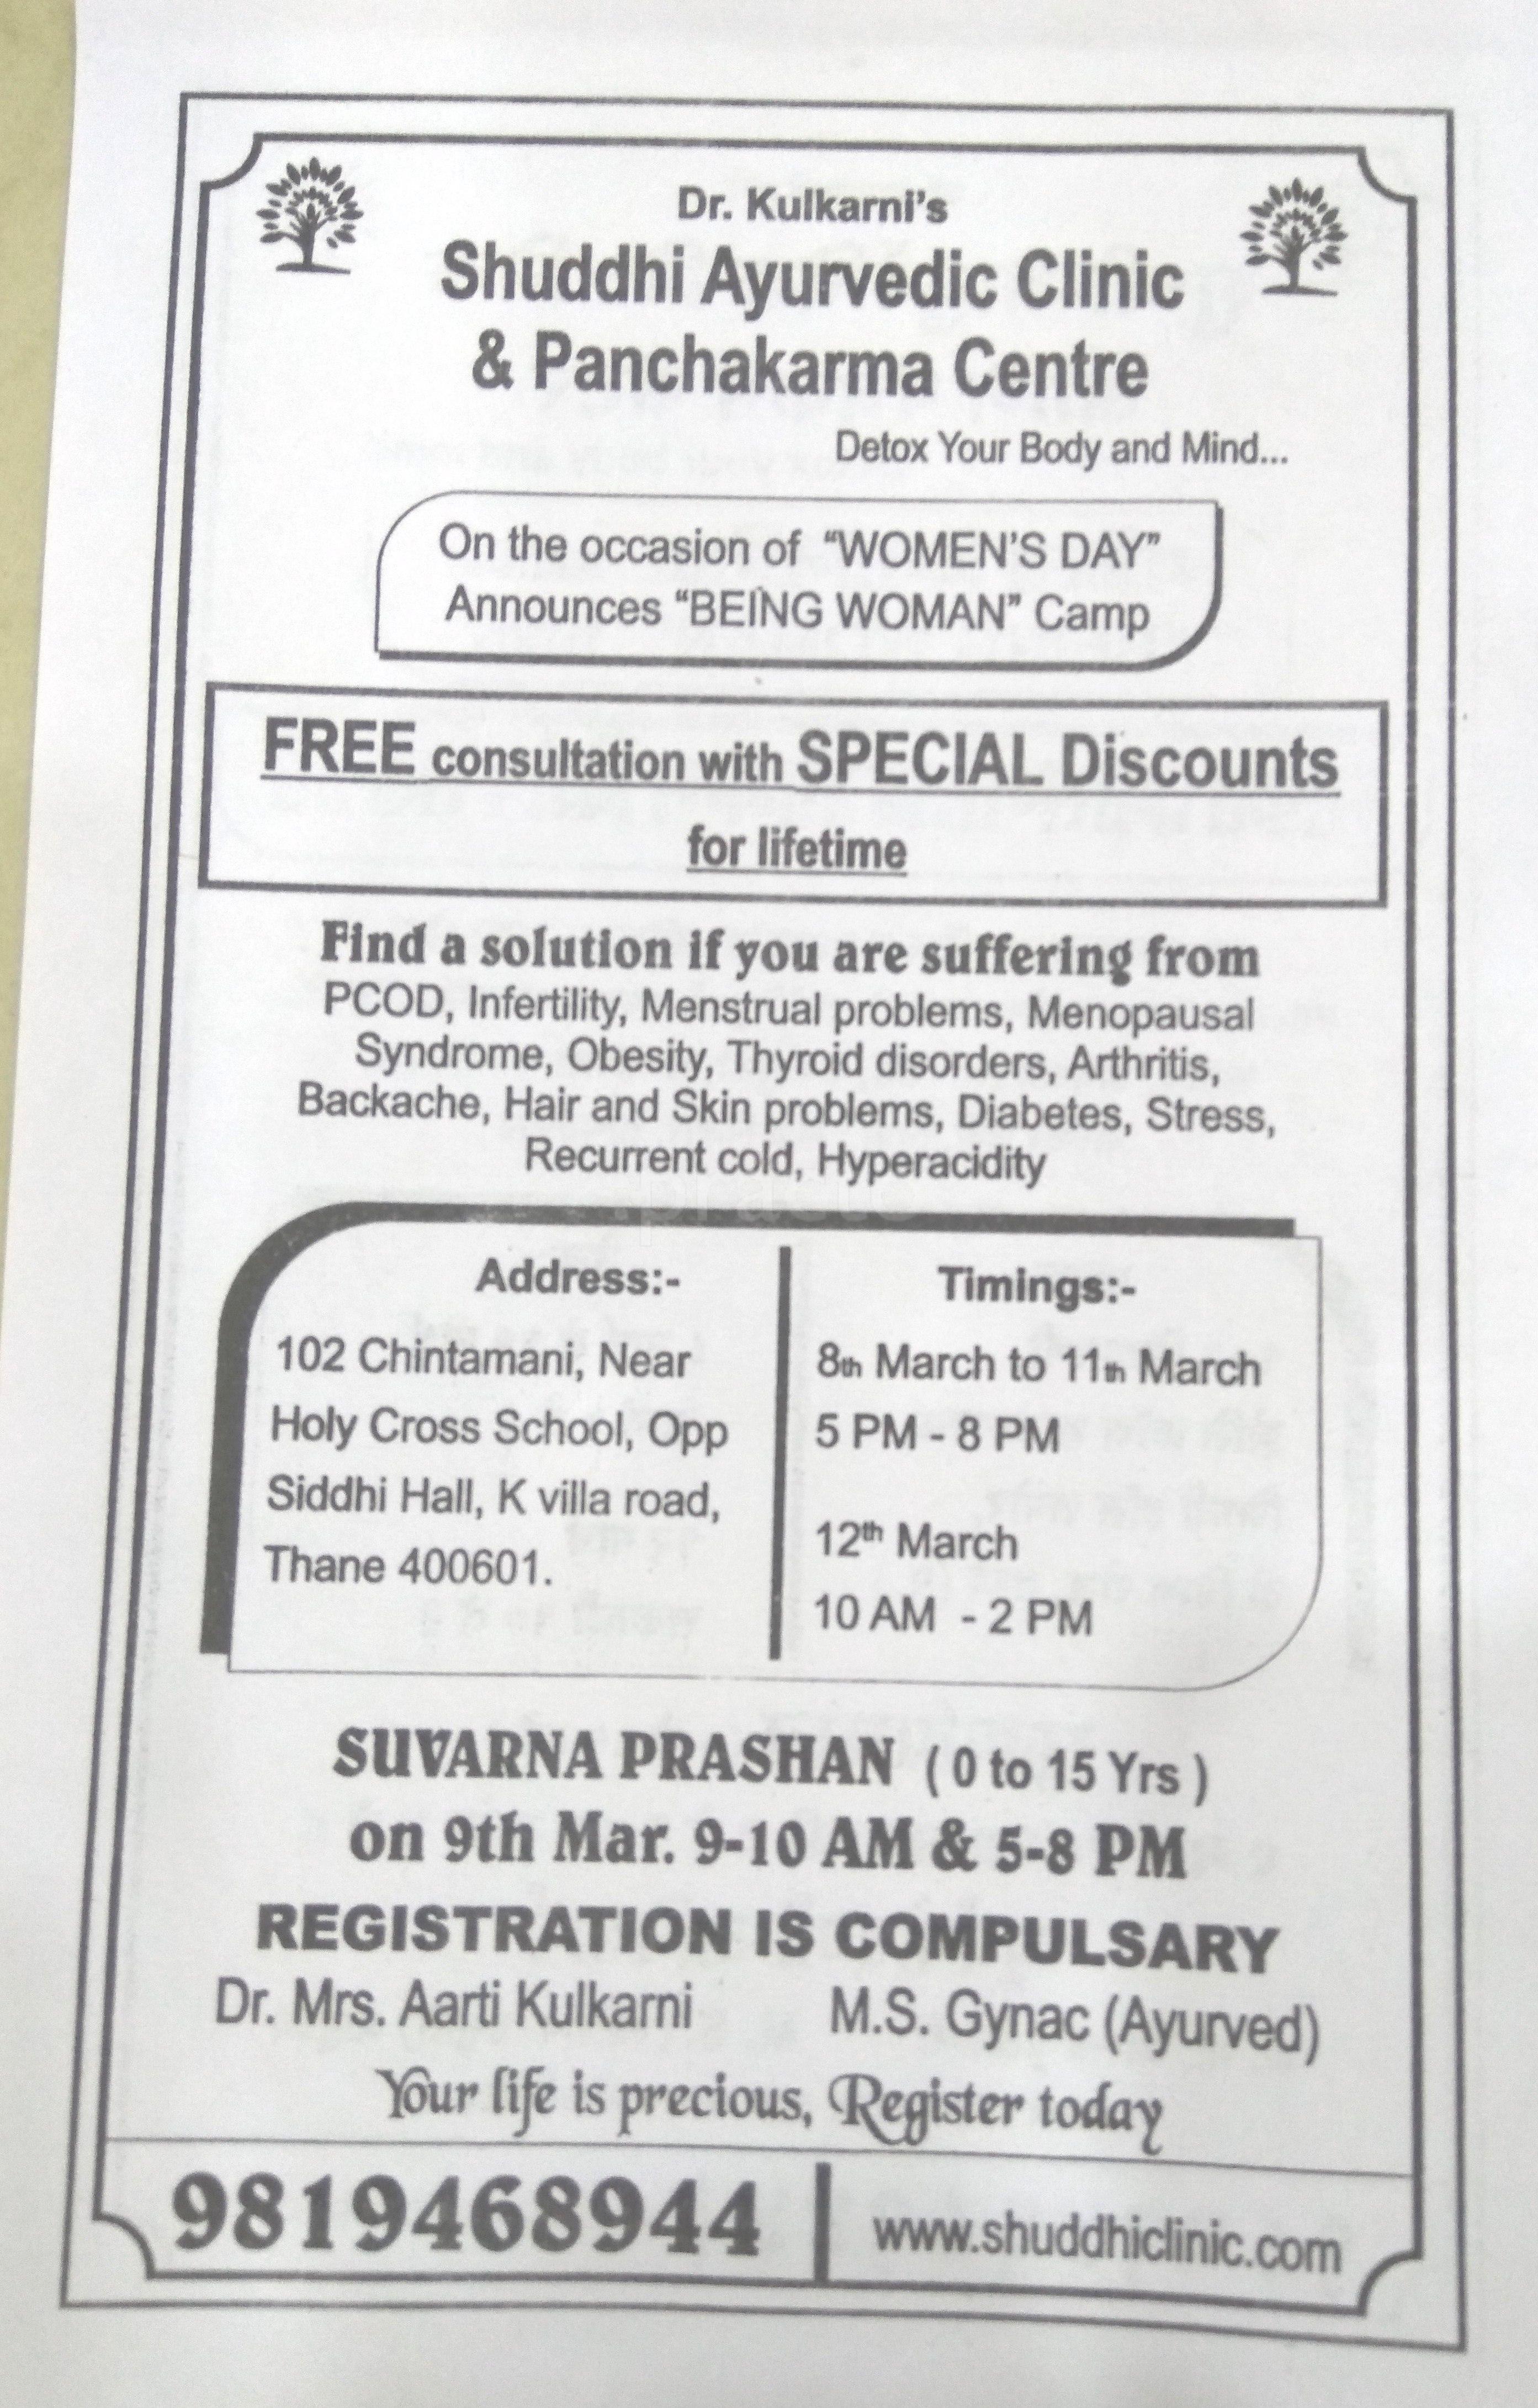 Shuddhi Ayurvedic Clinic and Panchakarma Centre, Ayurveda Clinic in